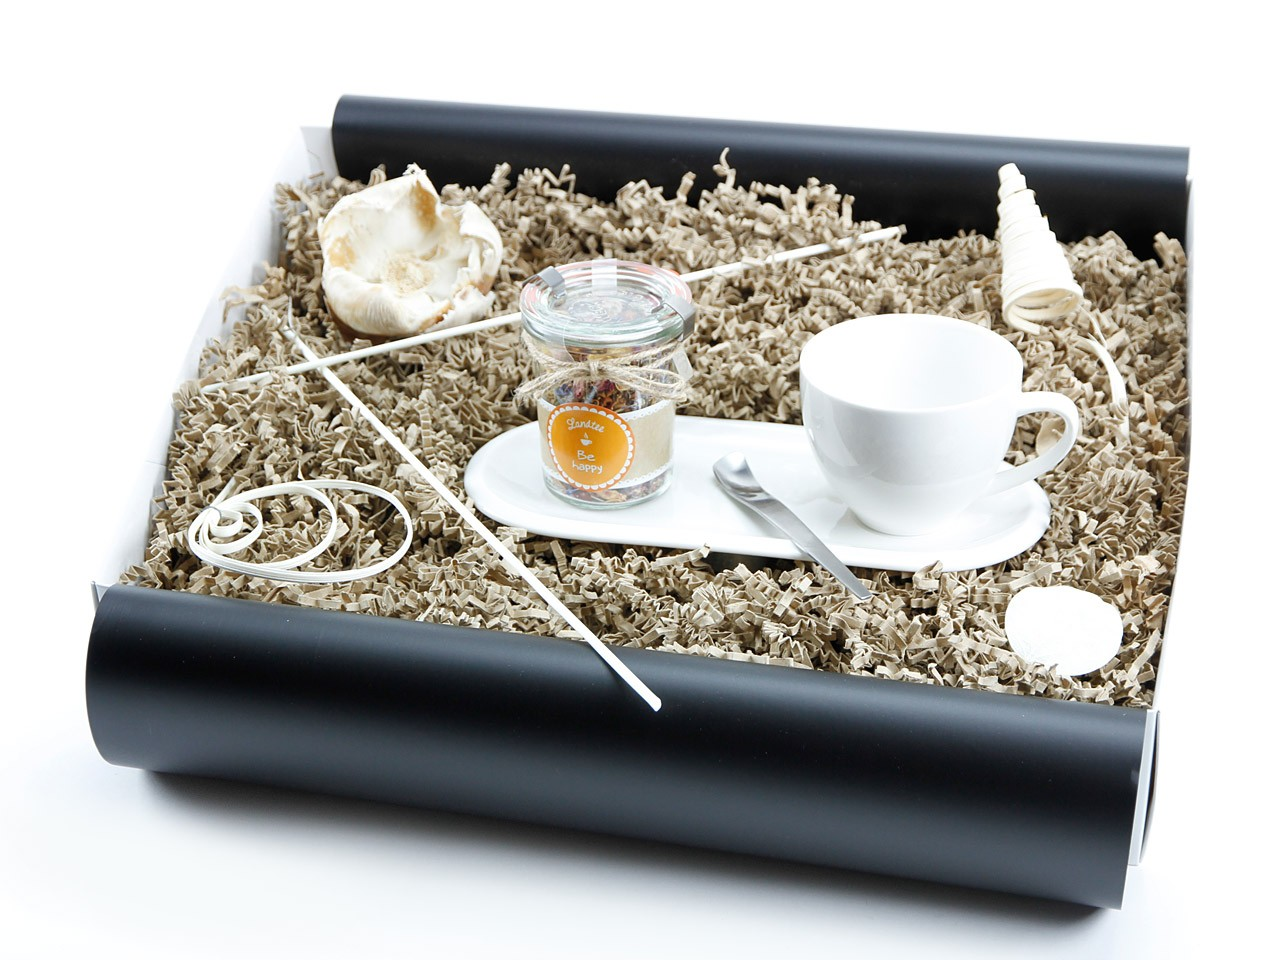 geschenk 66 geburtstag ideas in boxes blog. Black Bedroom Furniture Sets. Home Design Ideas